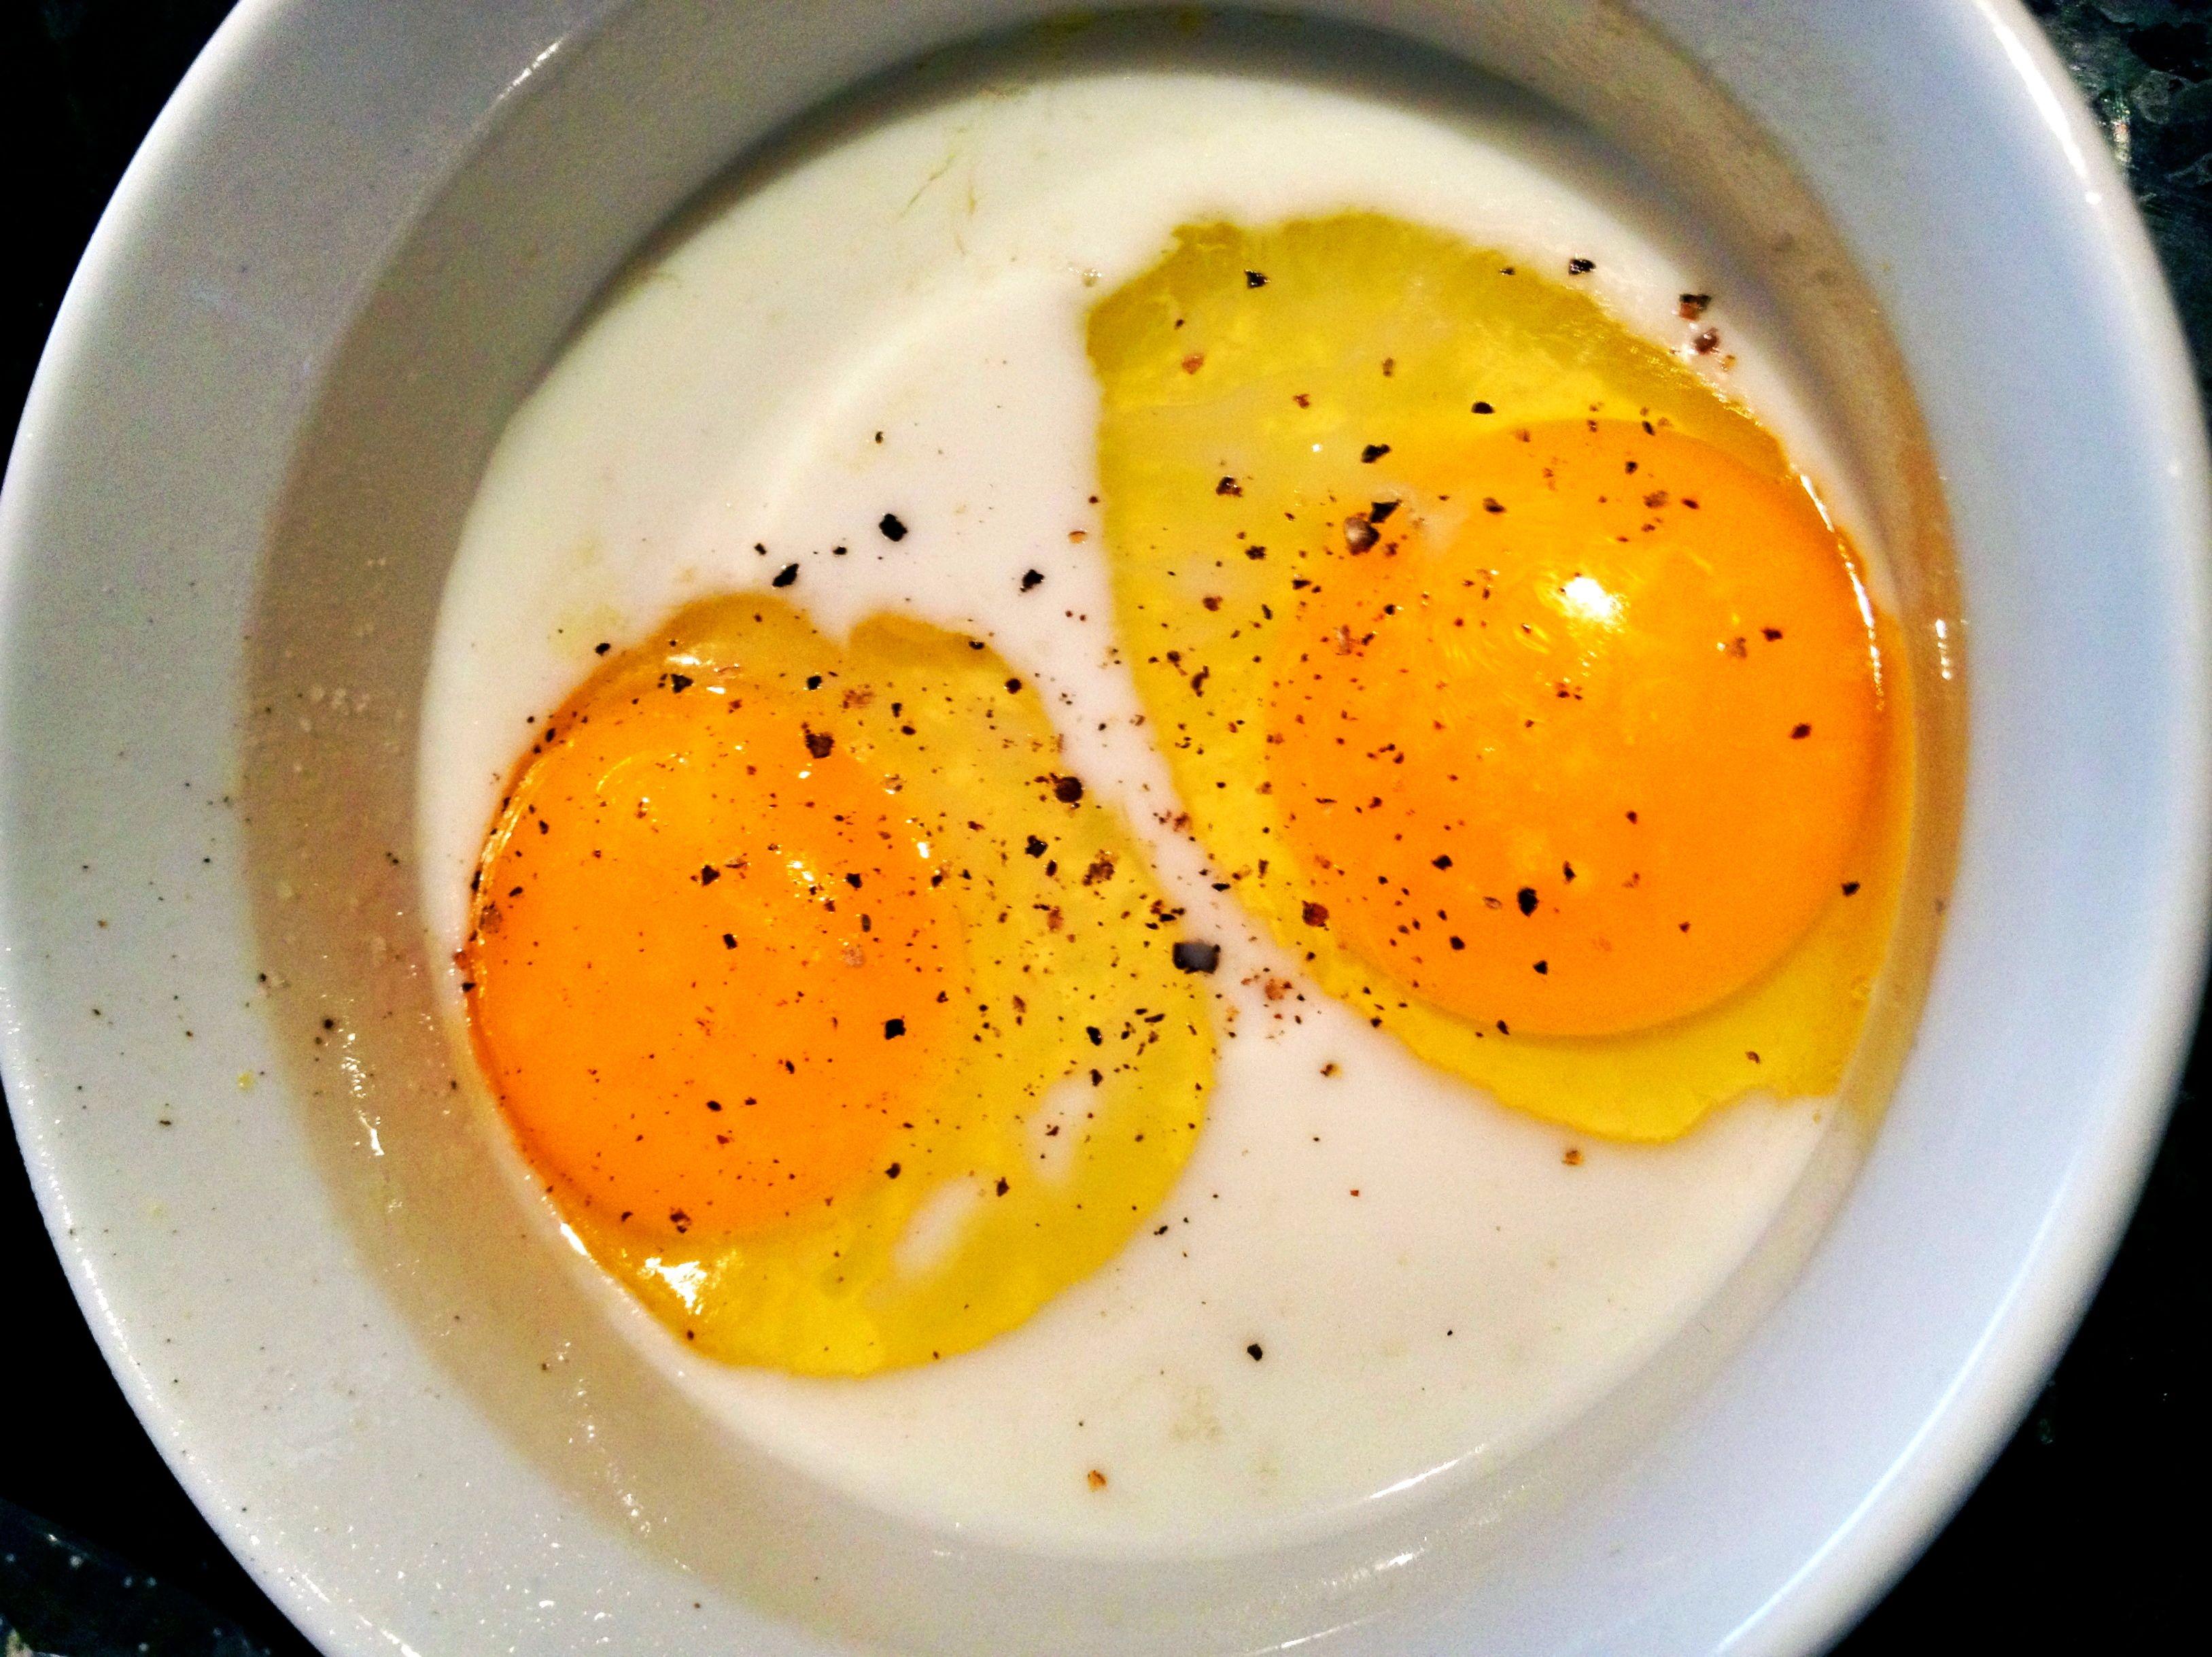 Eggs en Cocotte (Baked Eggs in a Ramekin) | Tina Evans